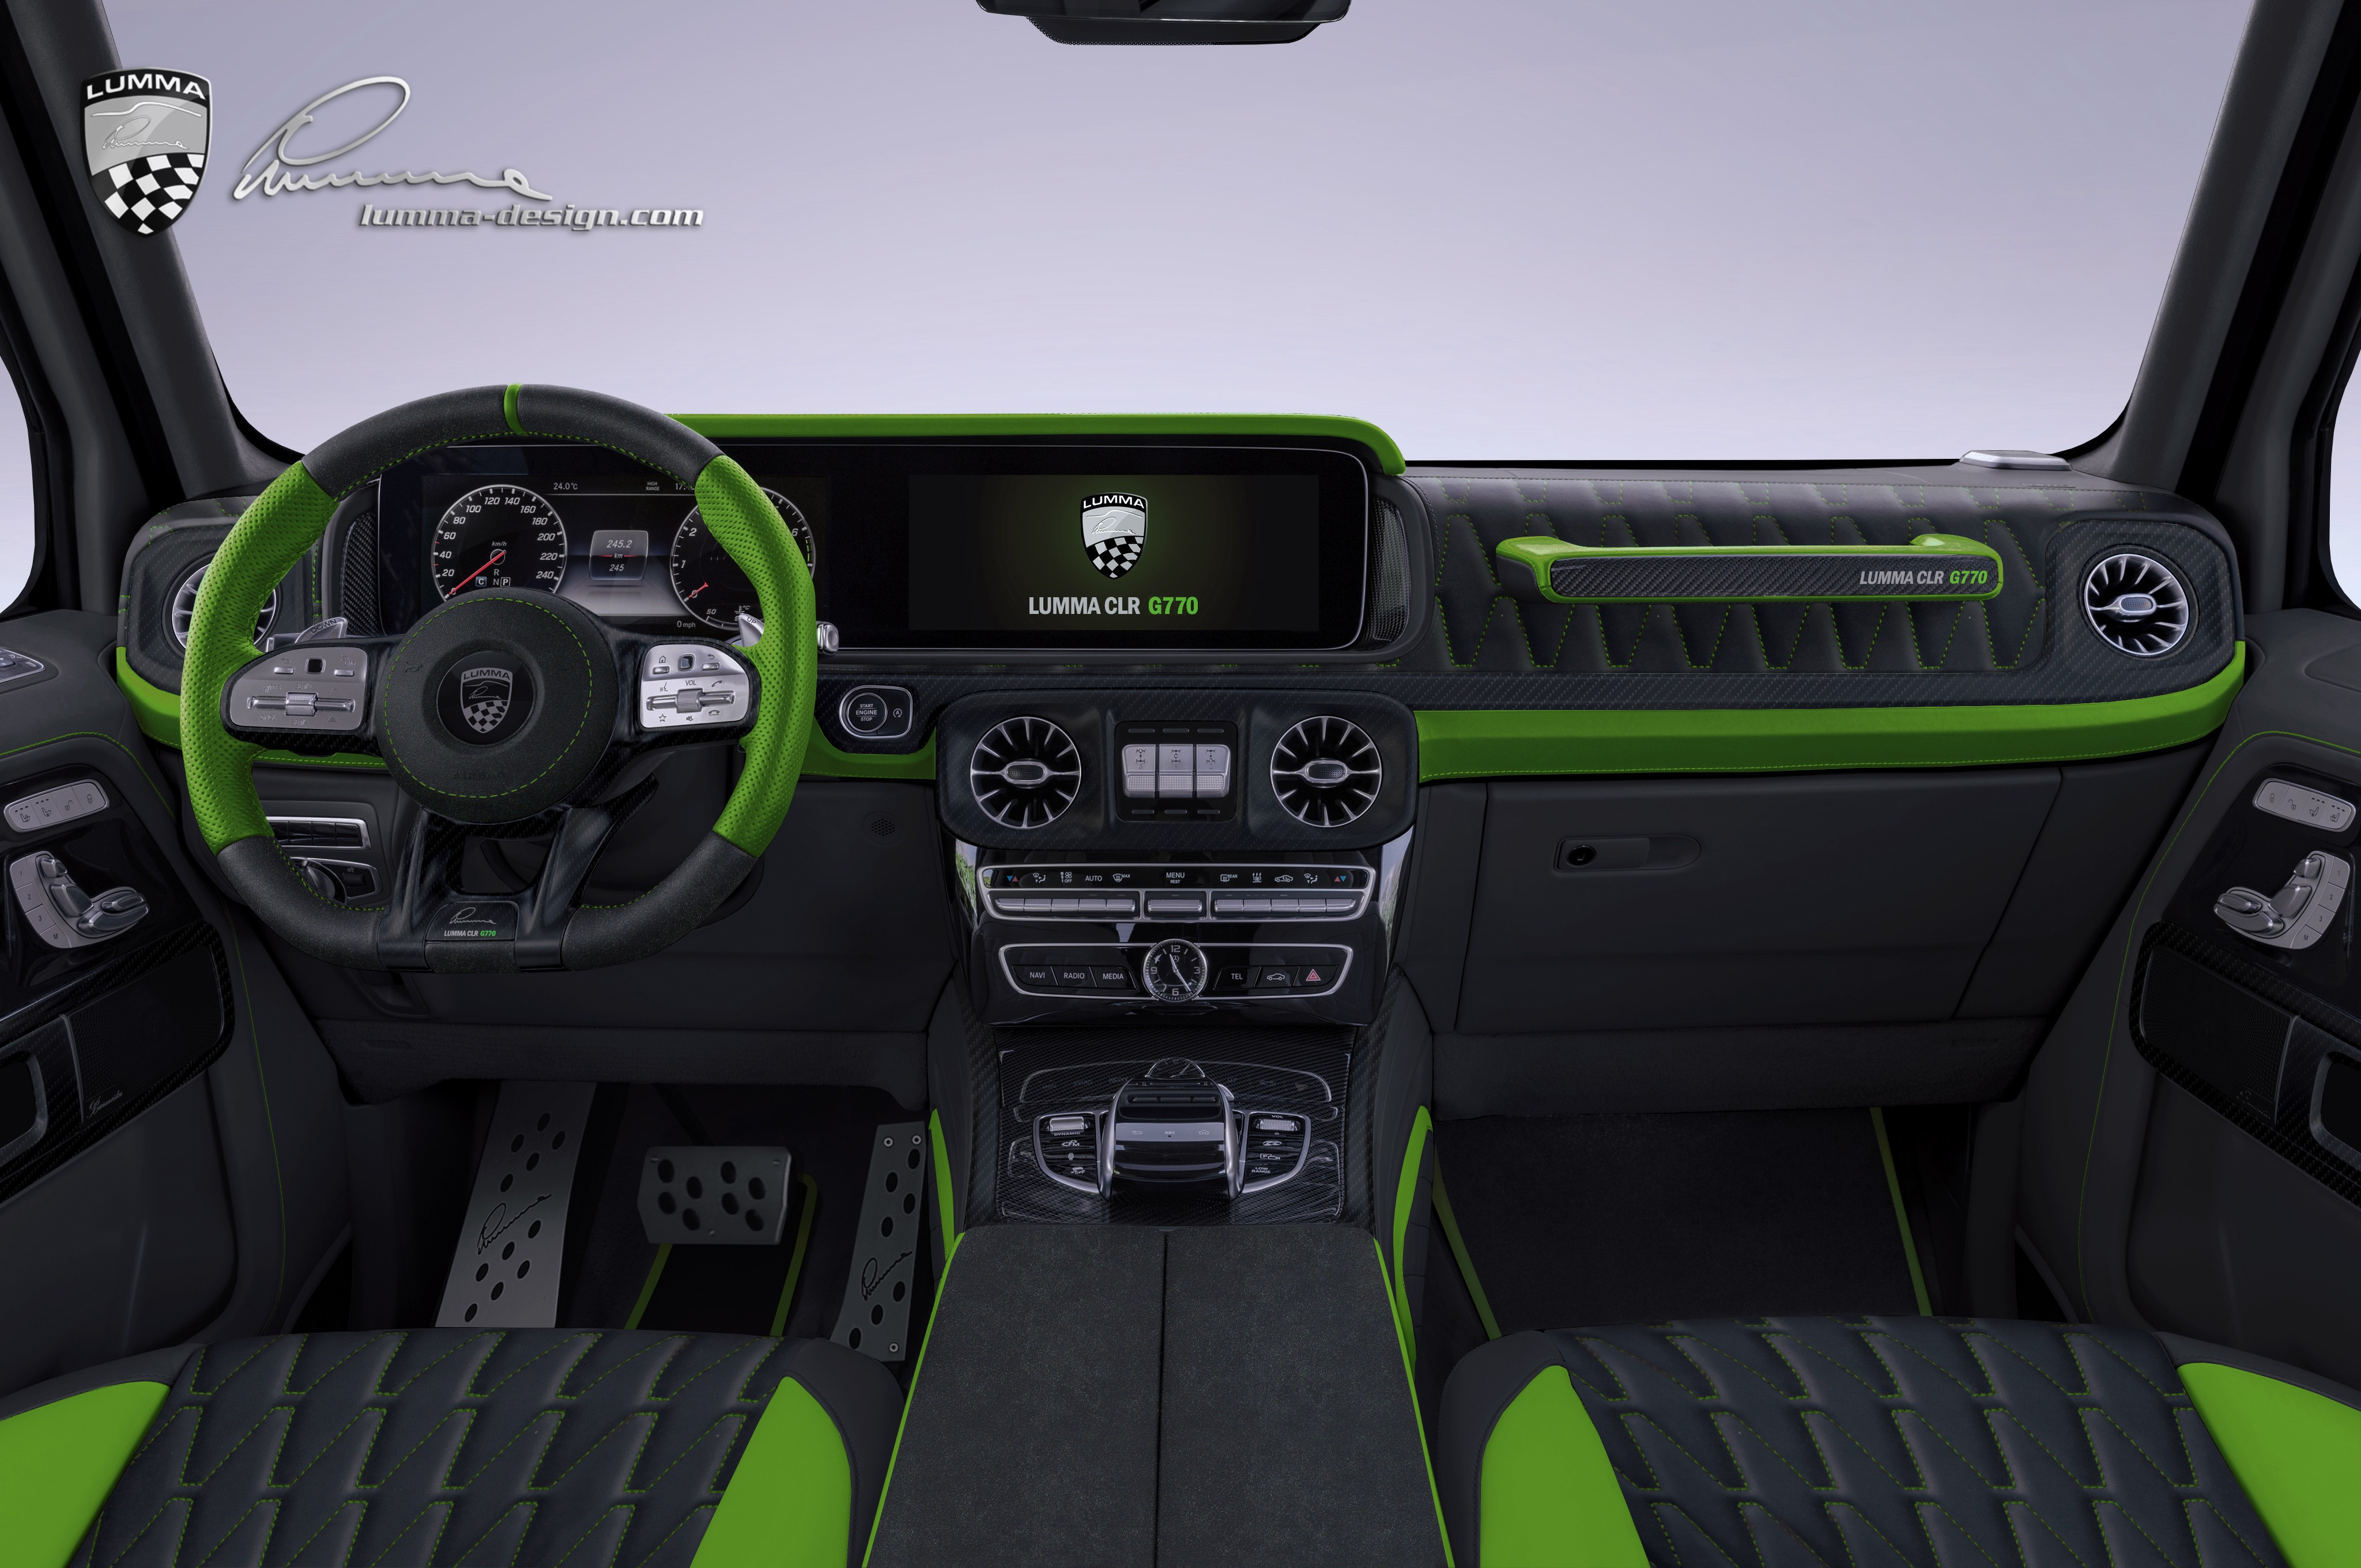 2019 G-Class CLR G770 Body Kit Previewed by Lumma Design - autoevolution